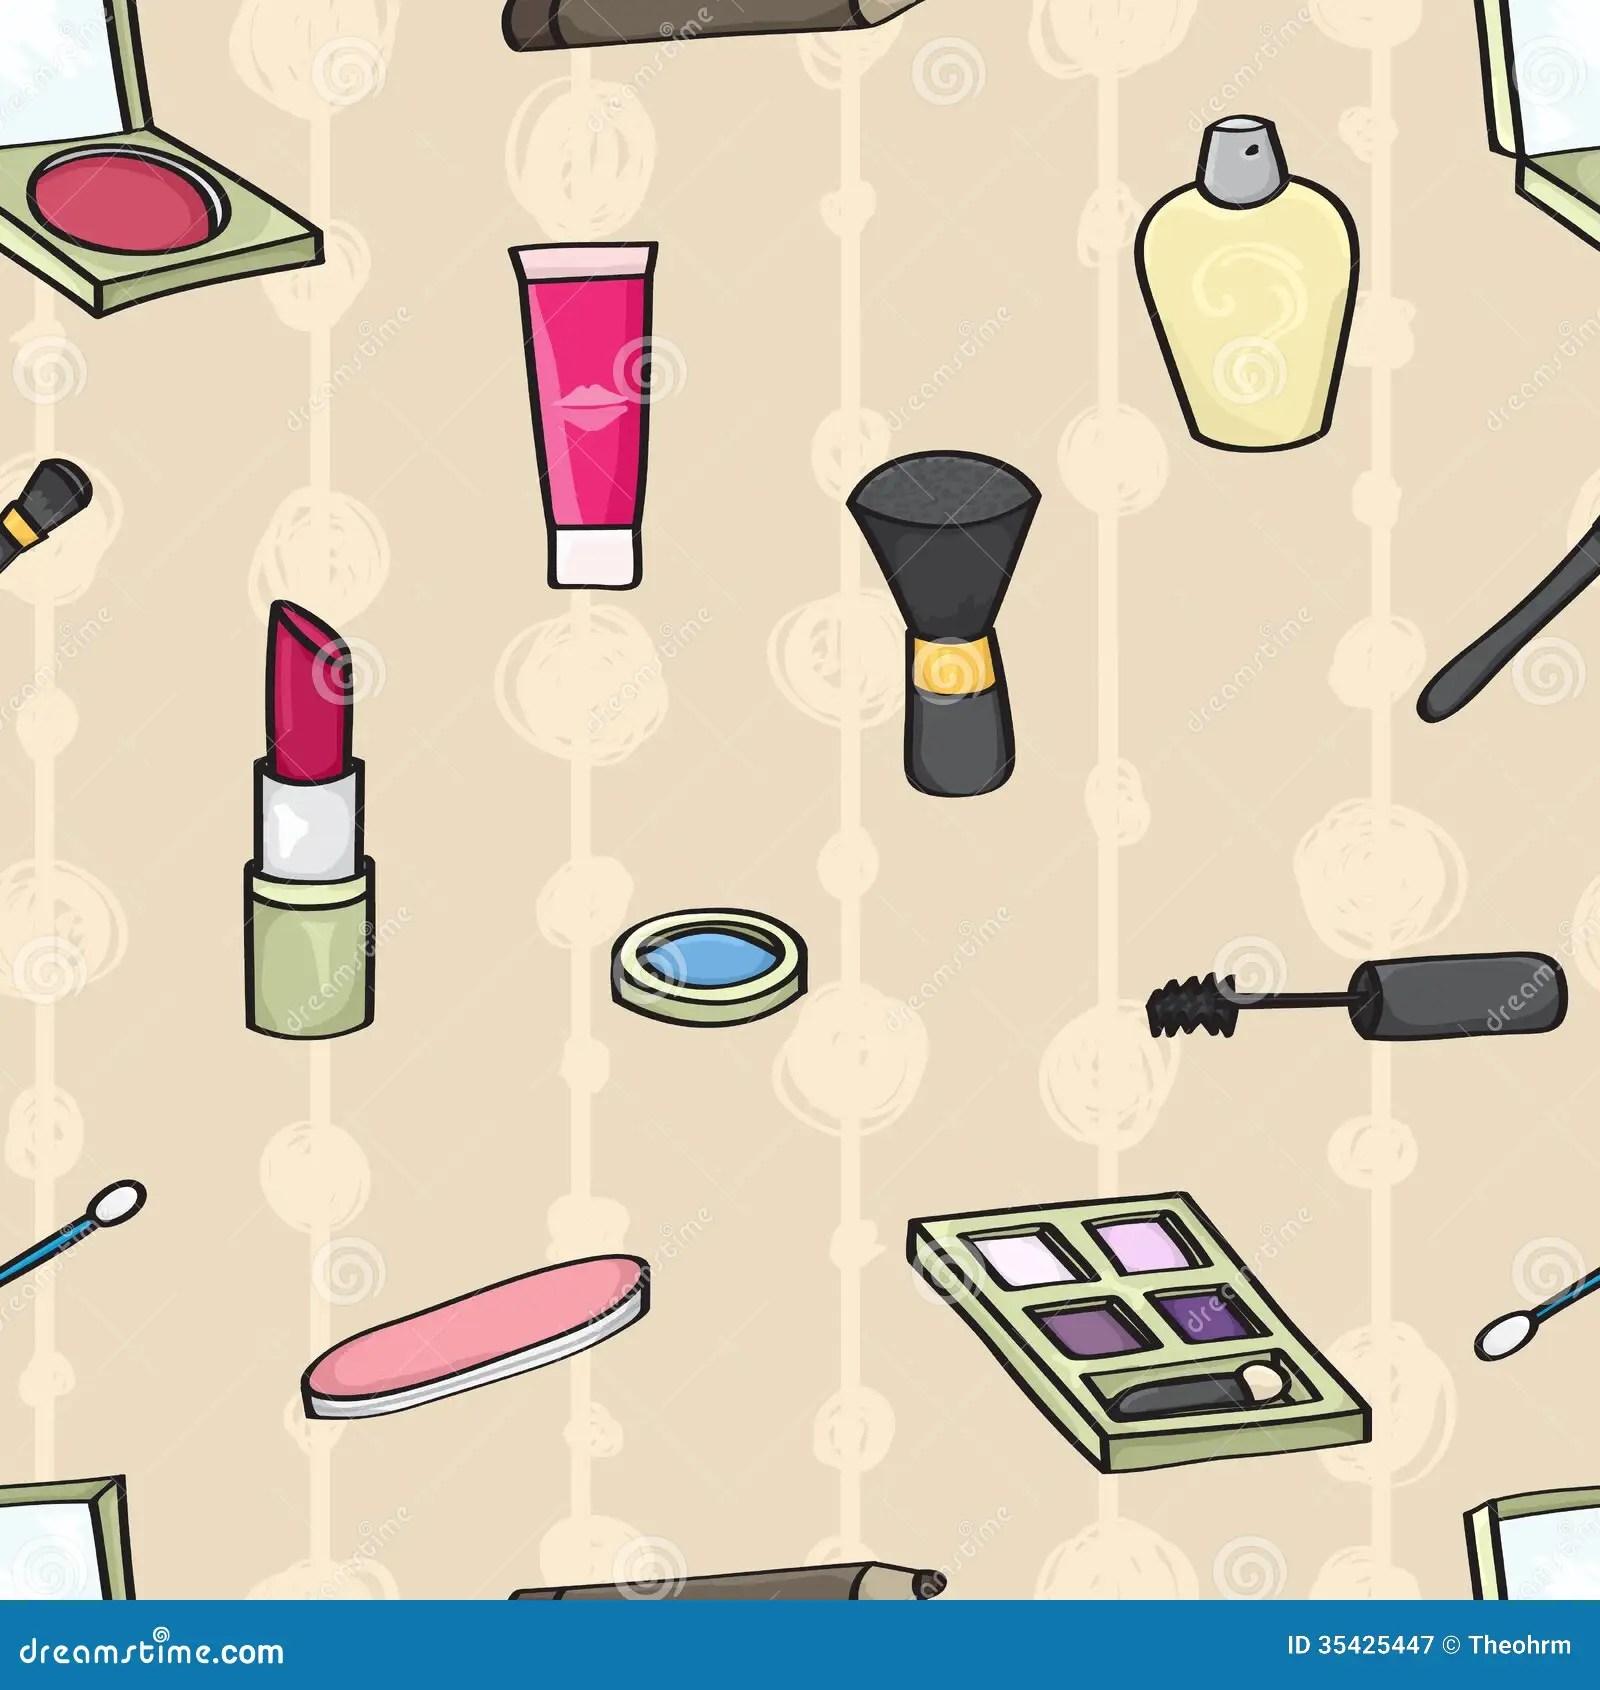 Cute Nail Arts Wallpaper Cartoon Cosmetics Seamless Background Royalty Free Stock